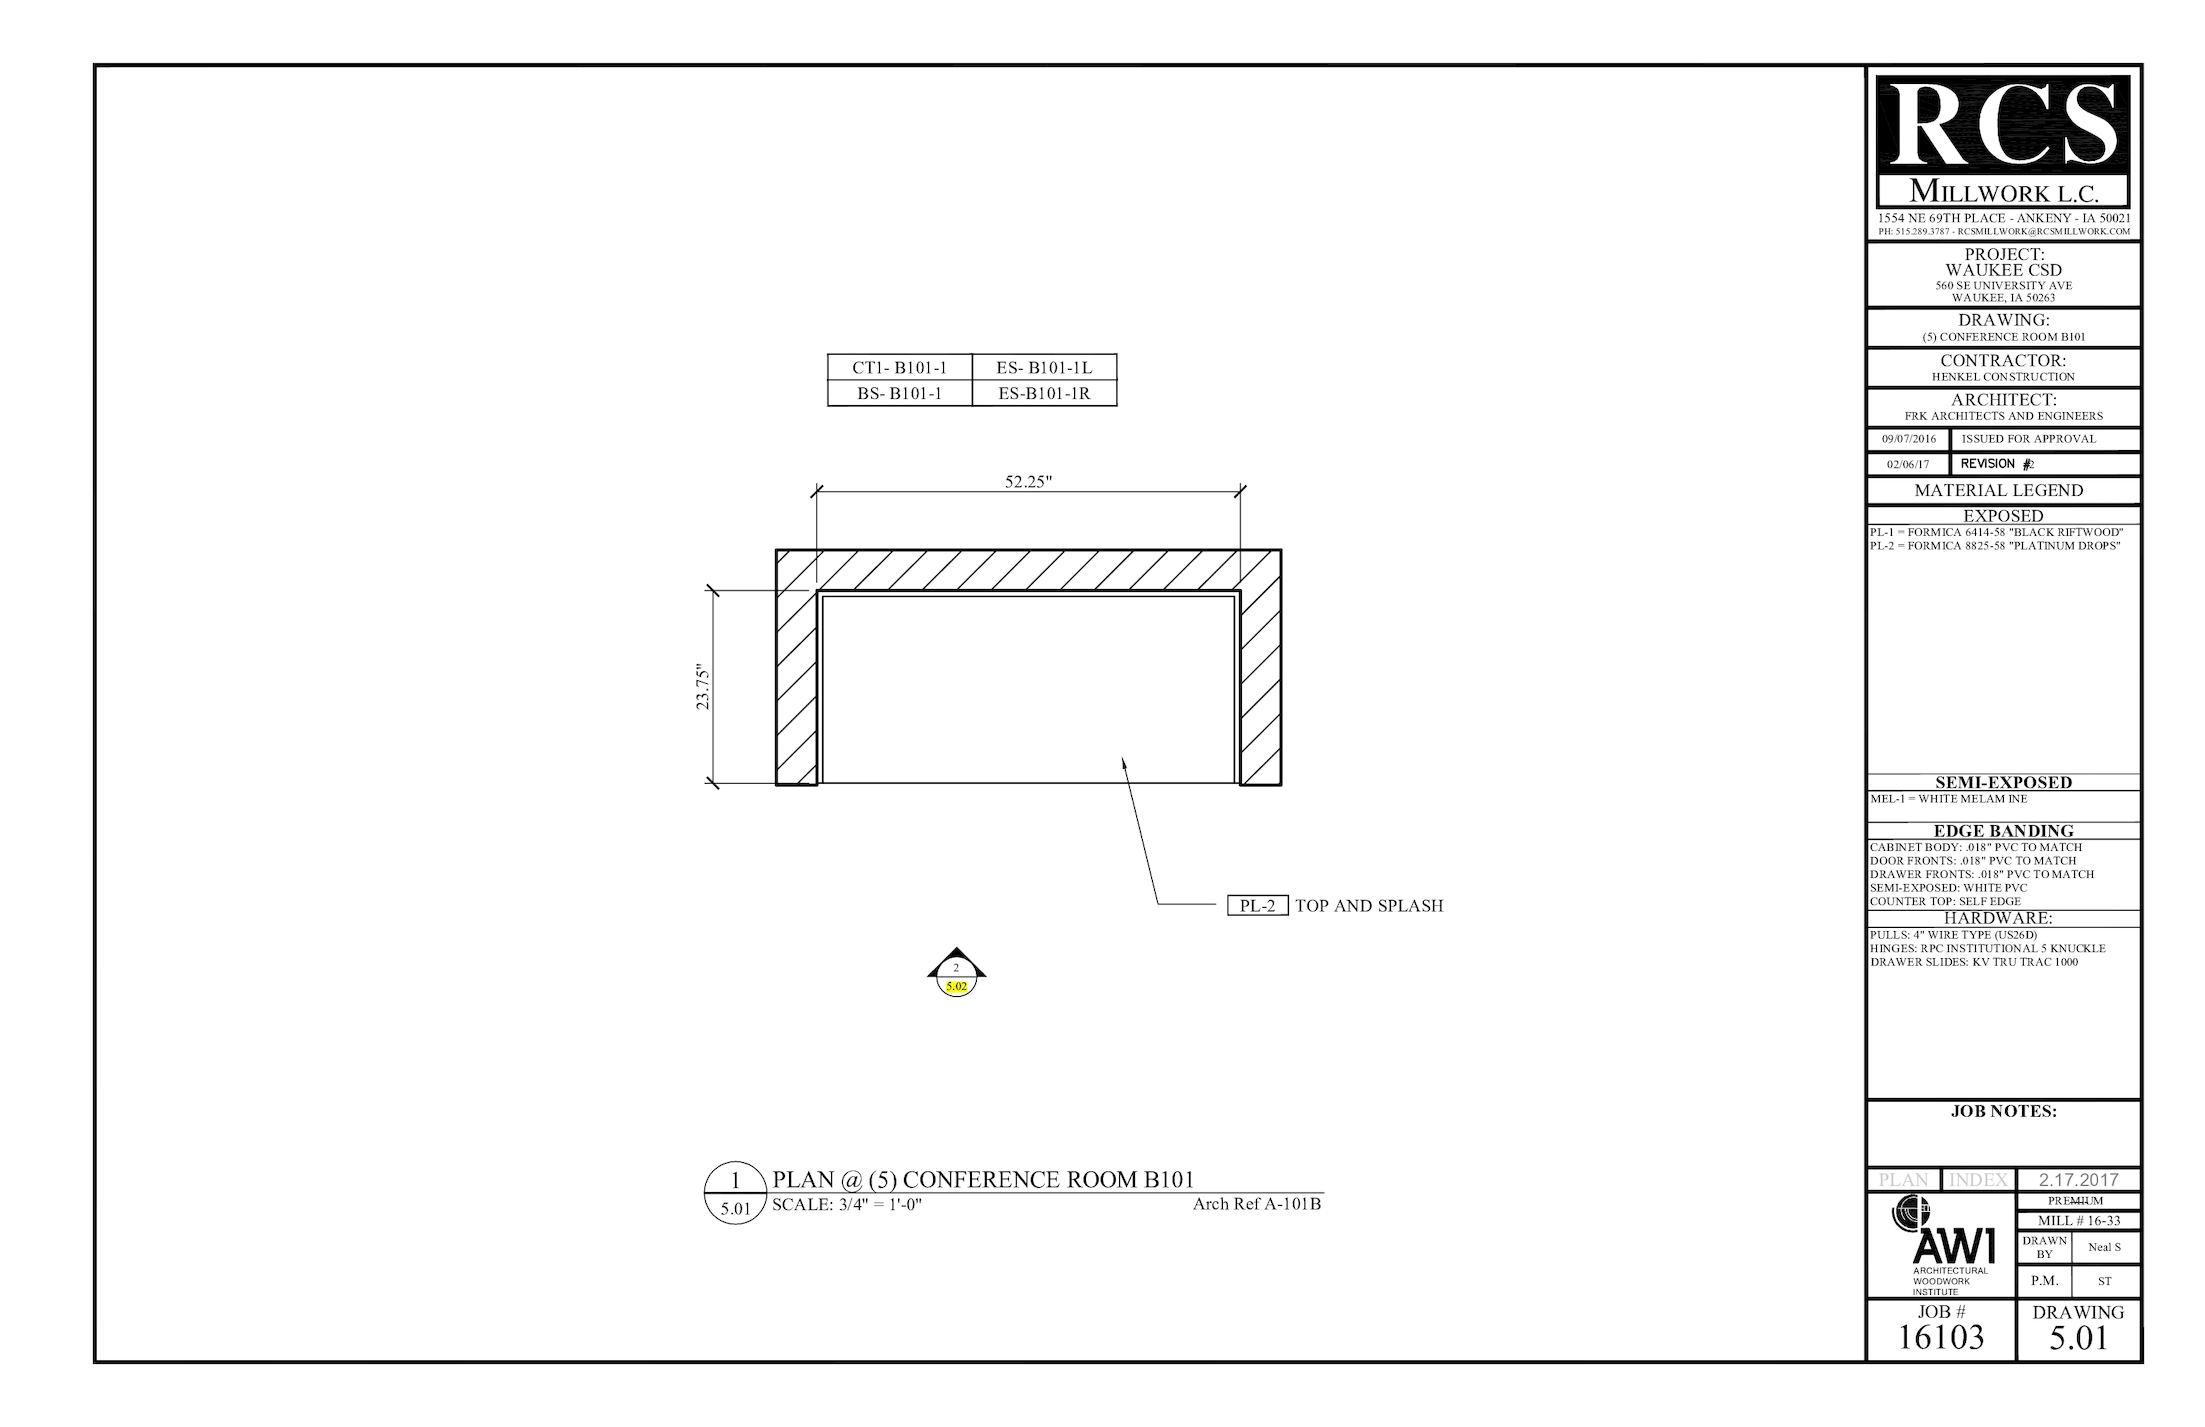 Calamo Shop Drawings 16103b 956 Wiring Diagram For Slide Room